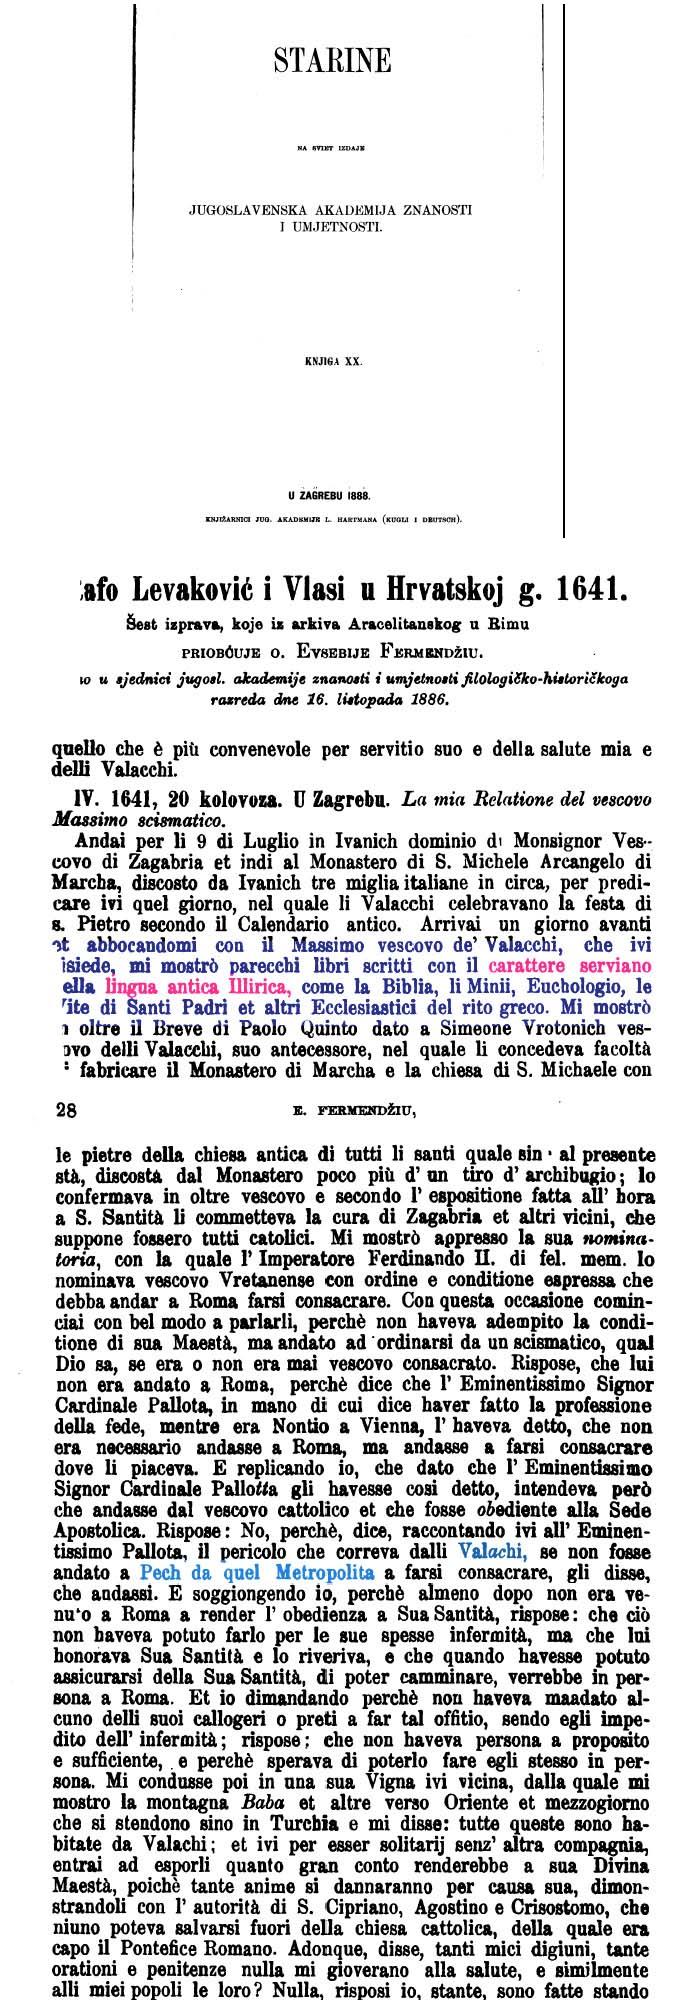 lingua antica illirica